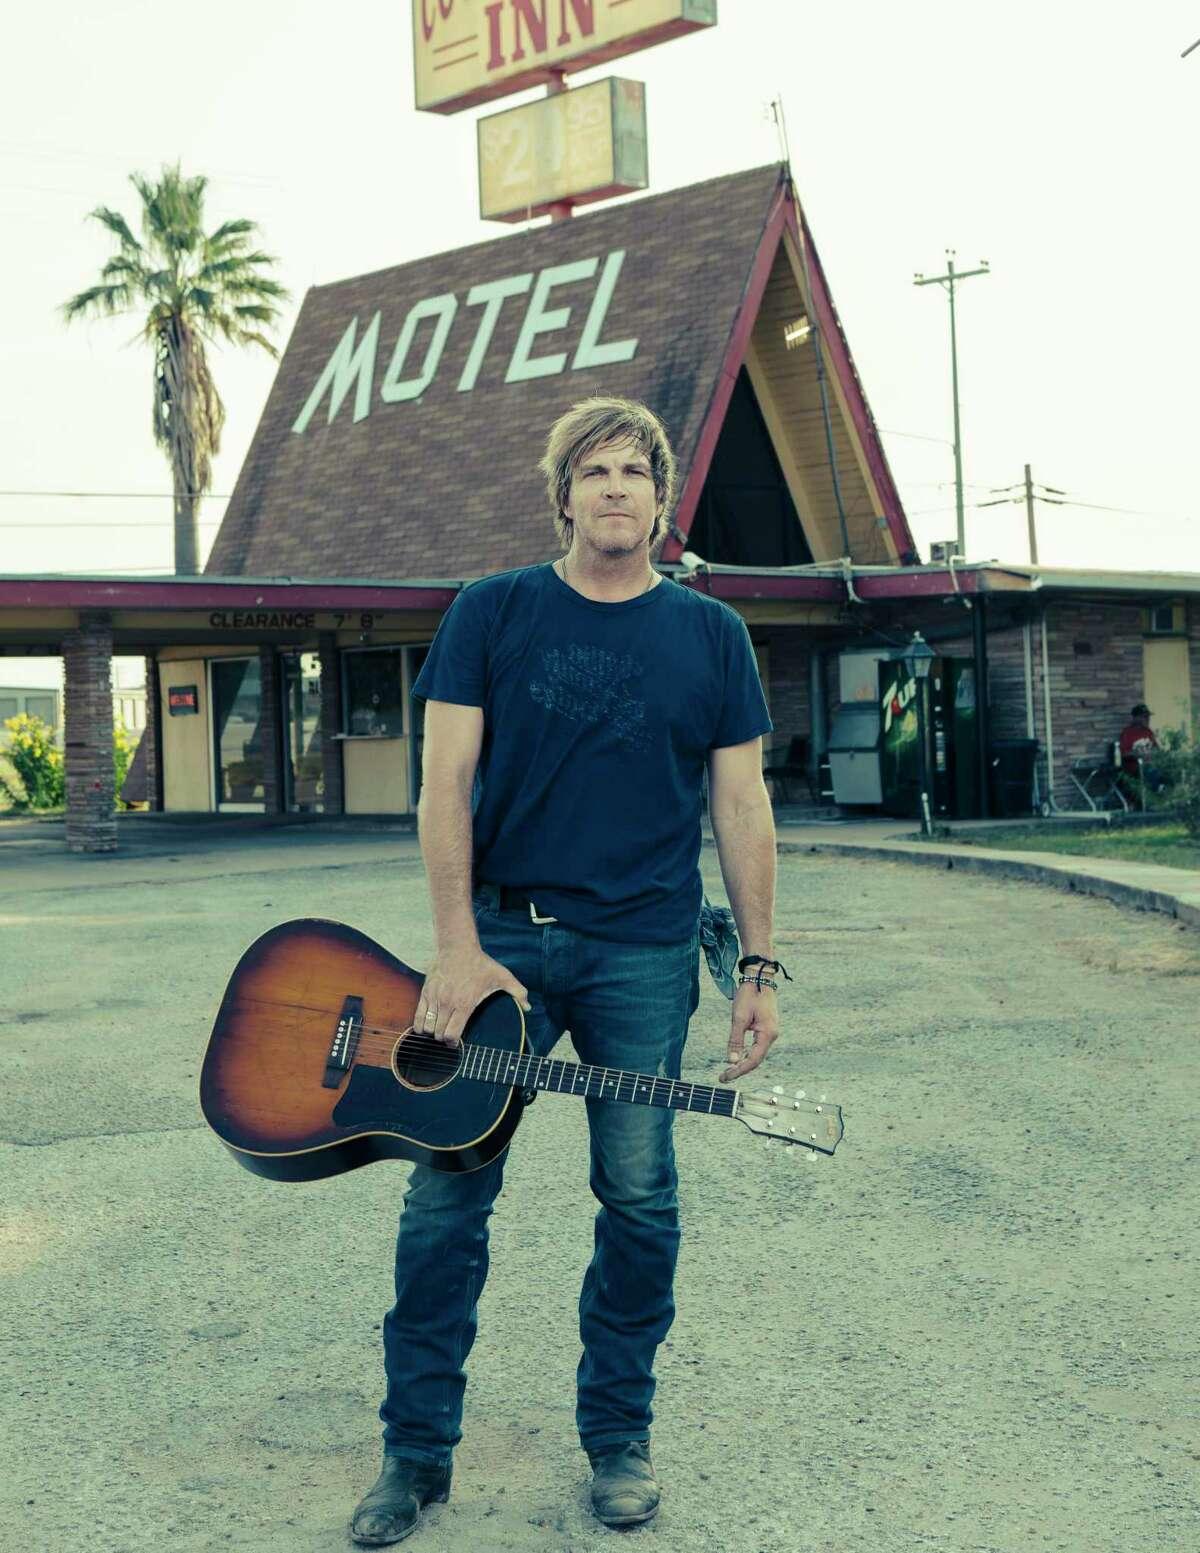 Texas singer-songwriter Jack Ingram will perform Oct. 6 at Main Street Crossing in Tomball.